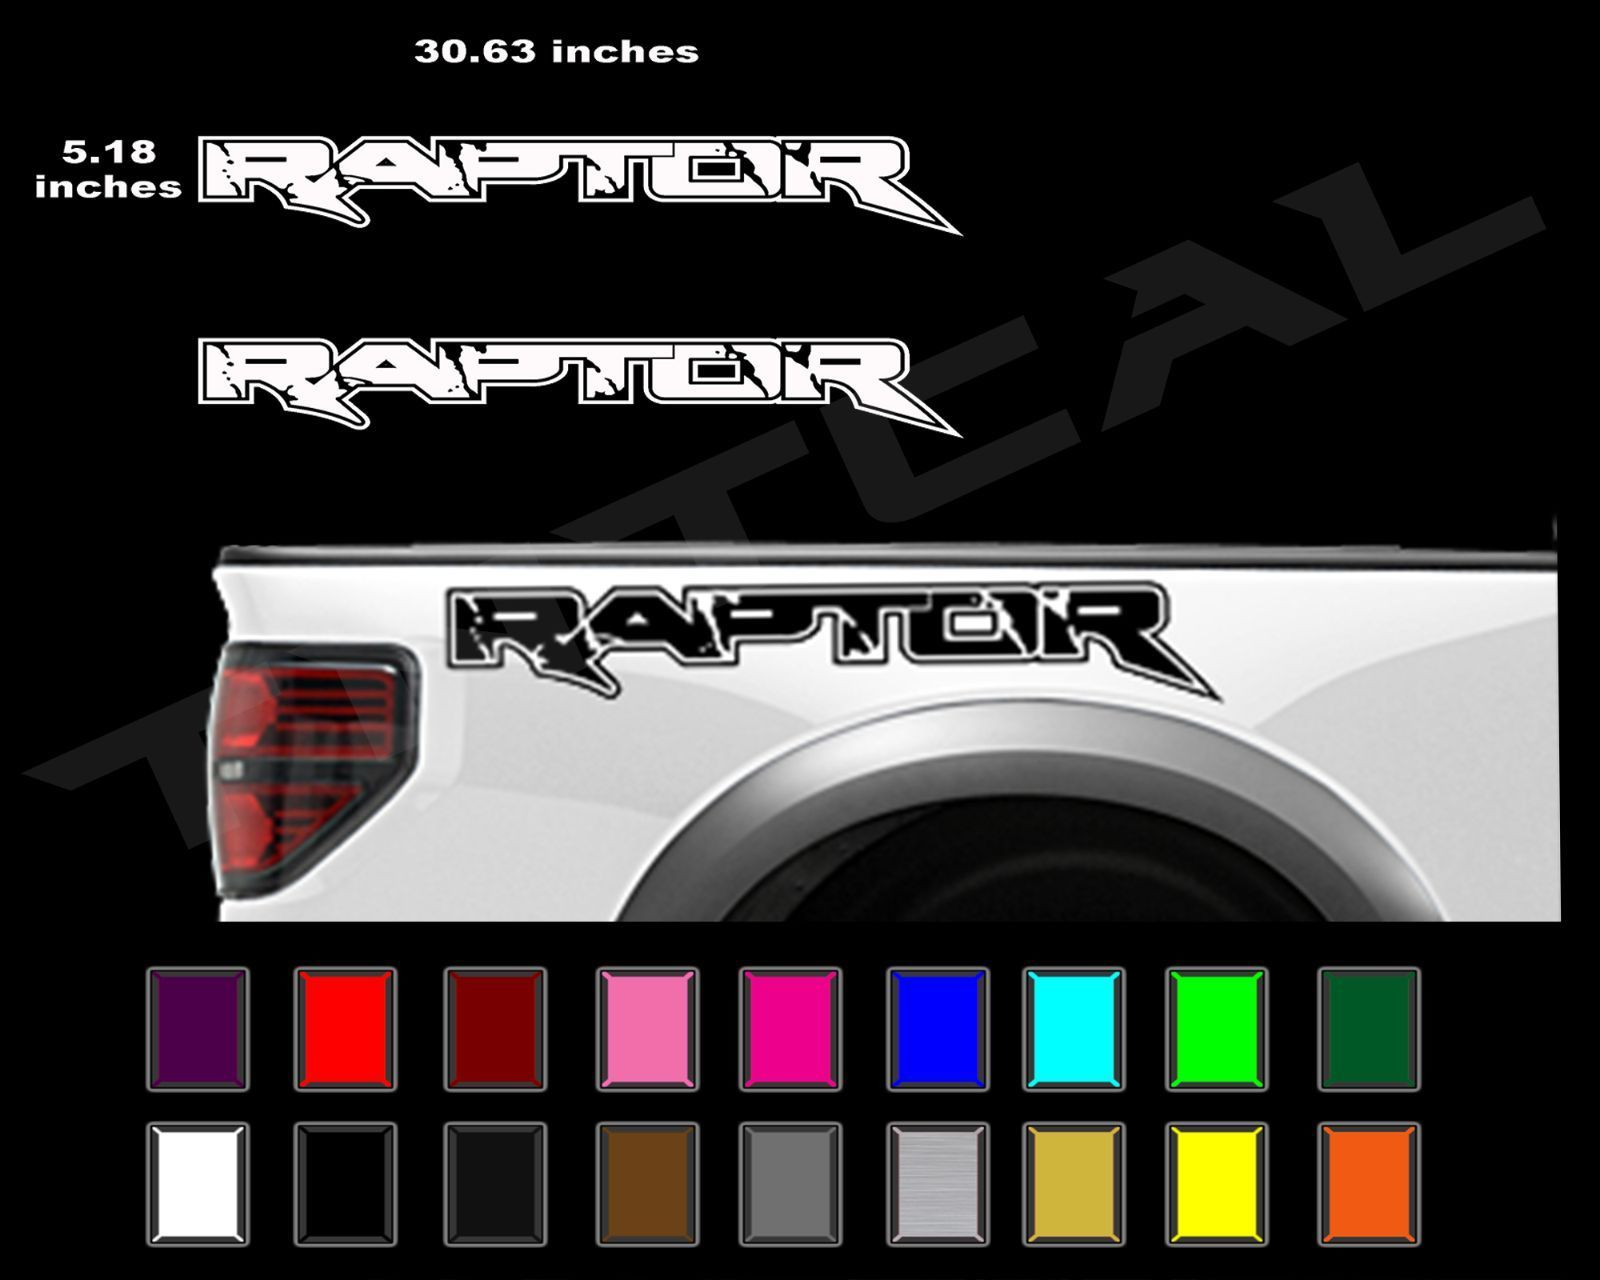 Ford Raptor Truck Side Bed Lettering Decals Vinyl Graphic Sticker 2010 2014 In Ebay Motors Parts Accessories Ca Ford Raptor Truck Ford Raptor Raptor Truck